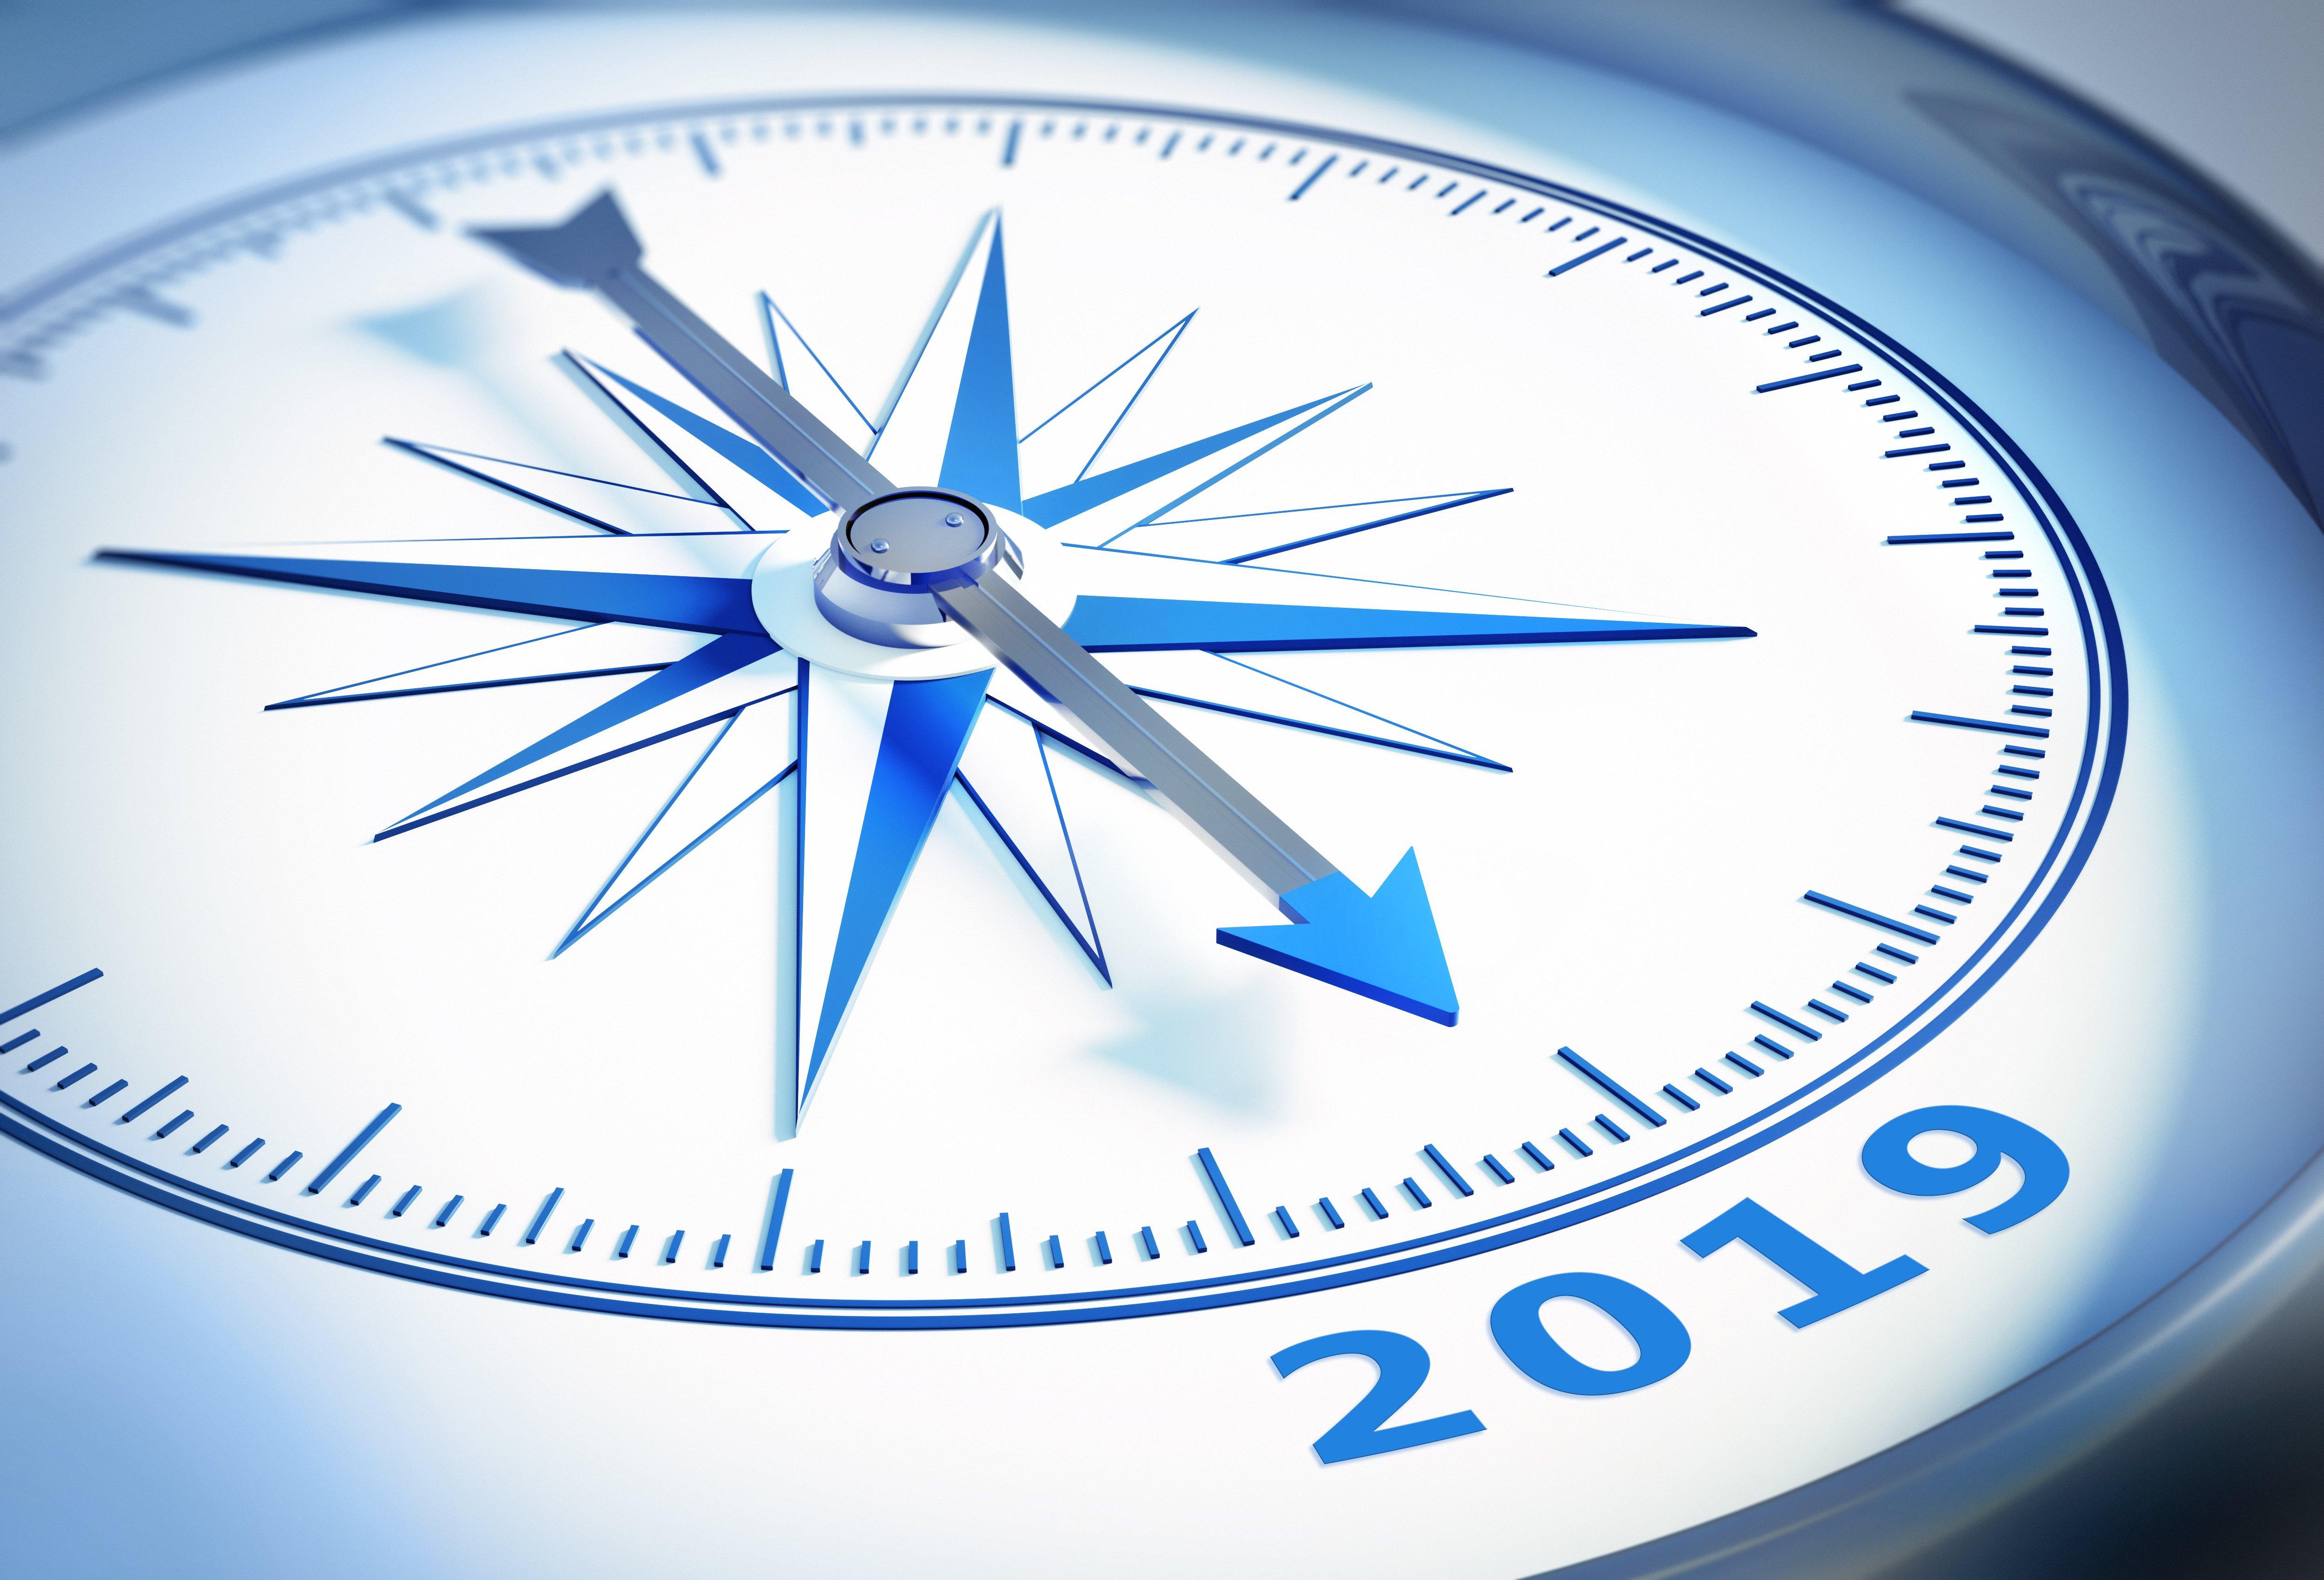 2019 Compass